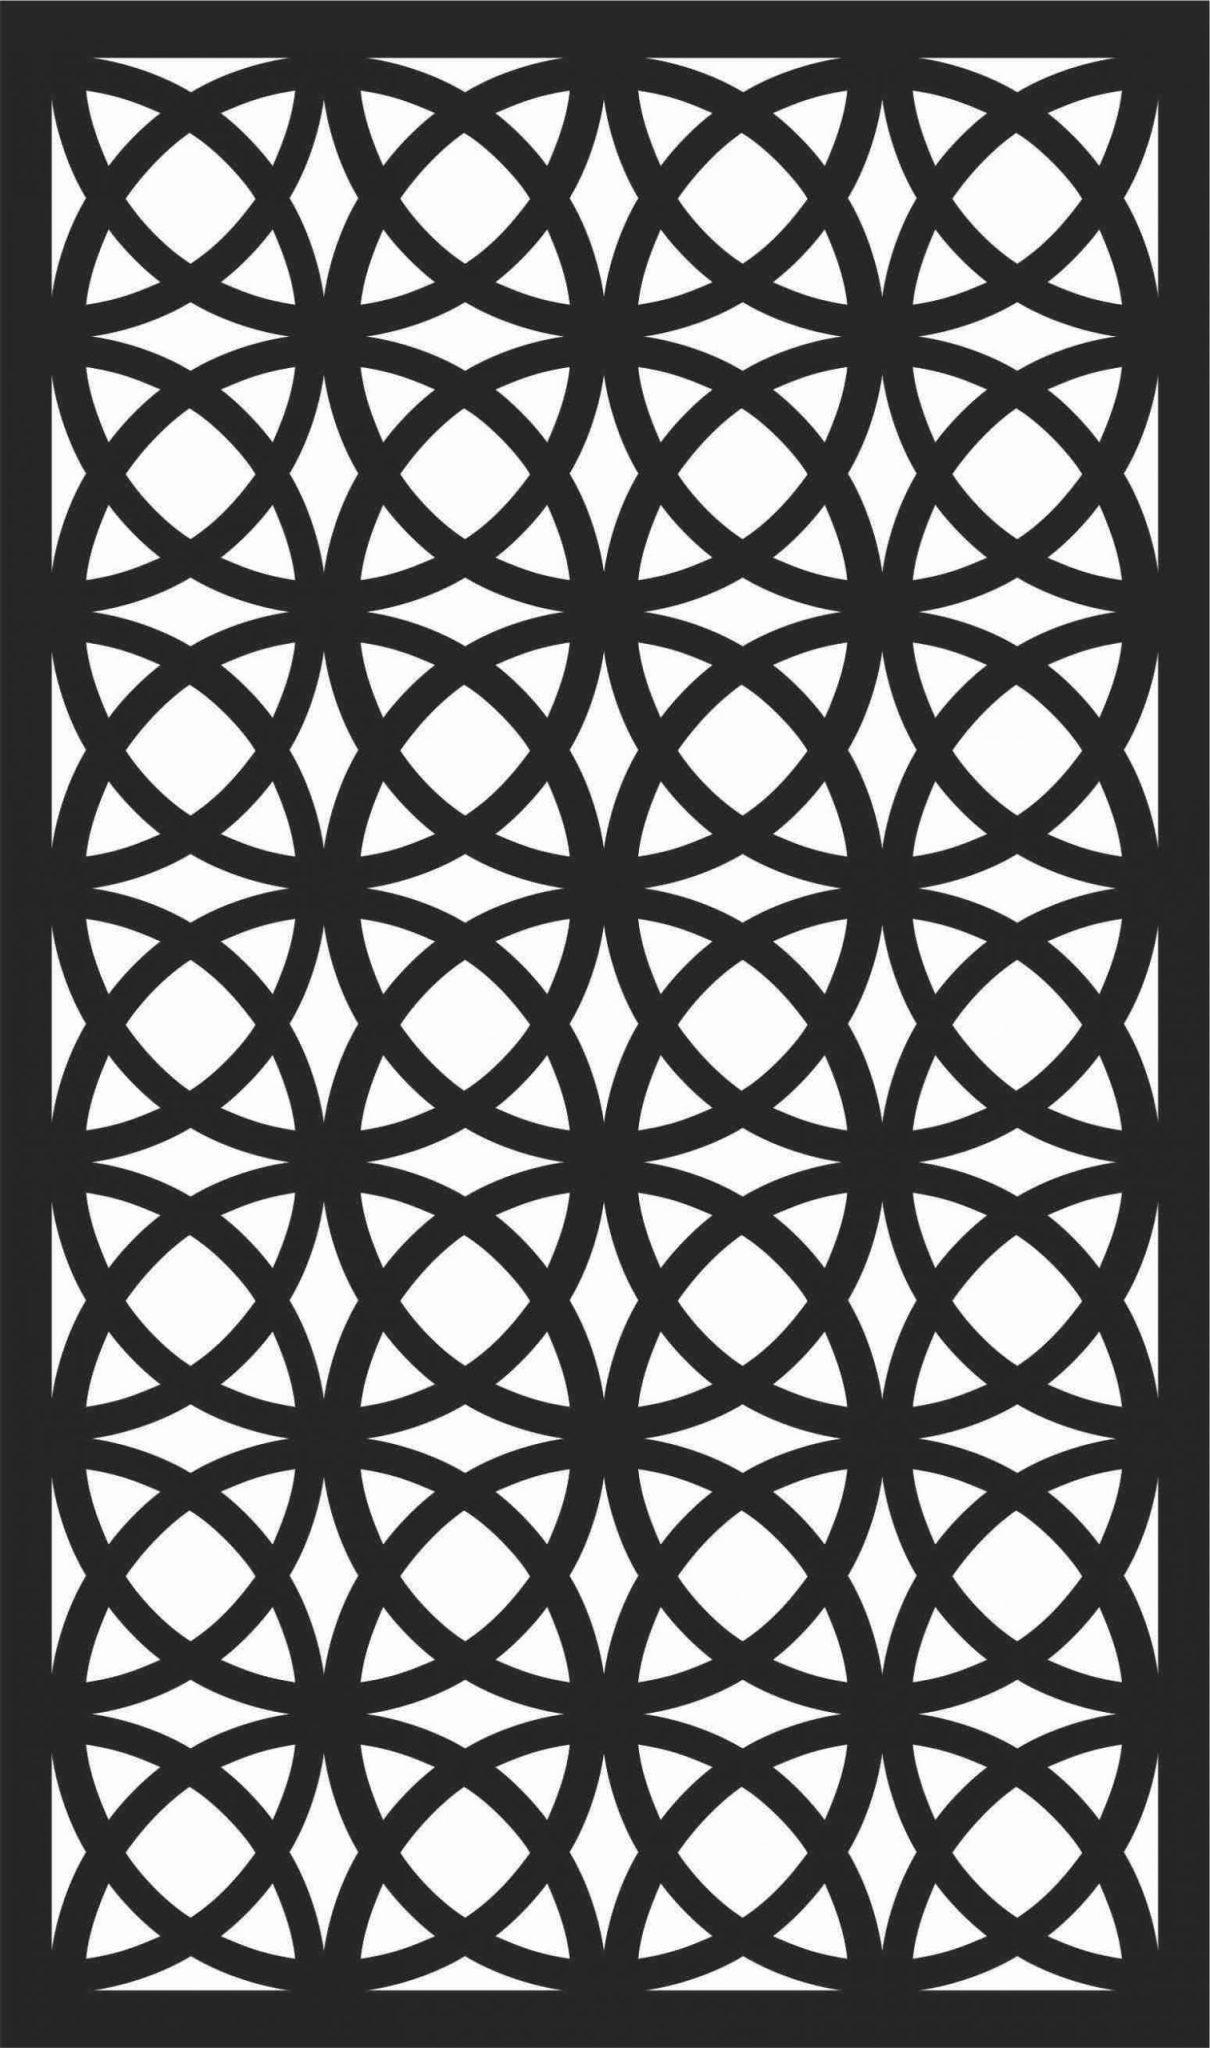 Screen Panel Patterns Seamless 14 Free DXF File